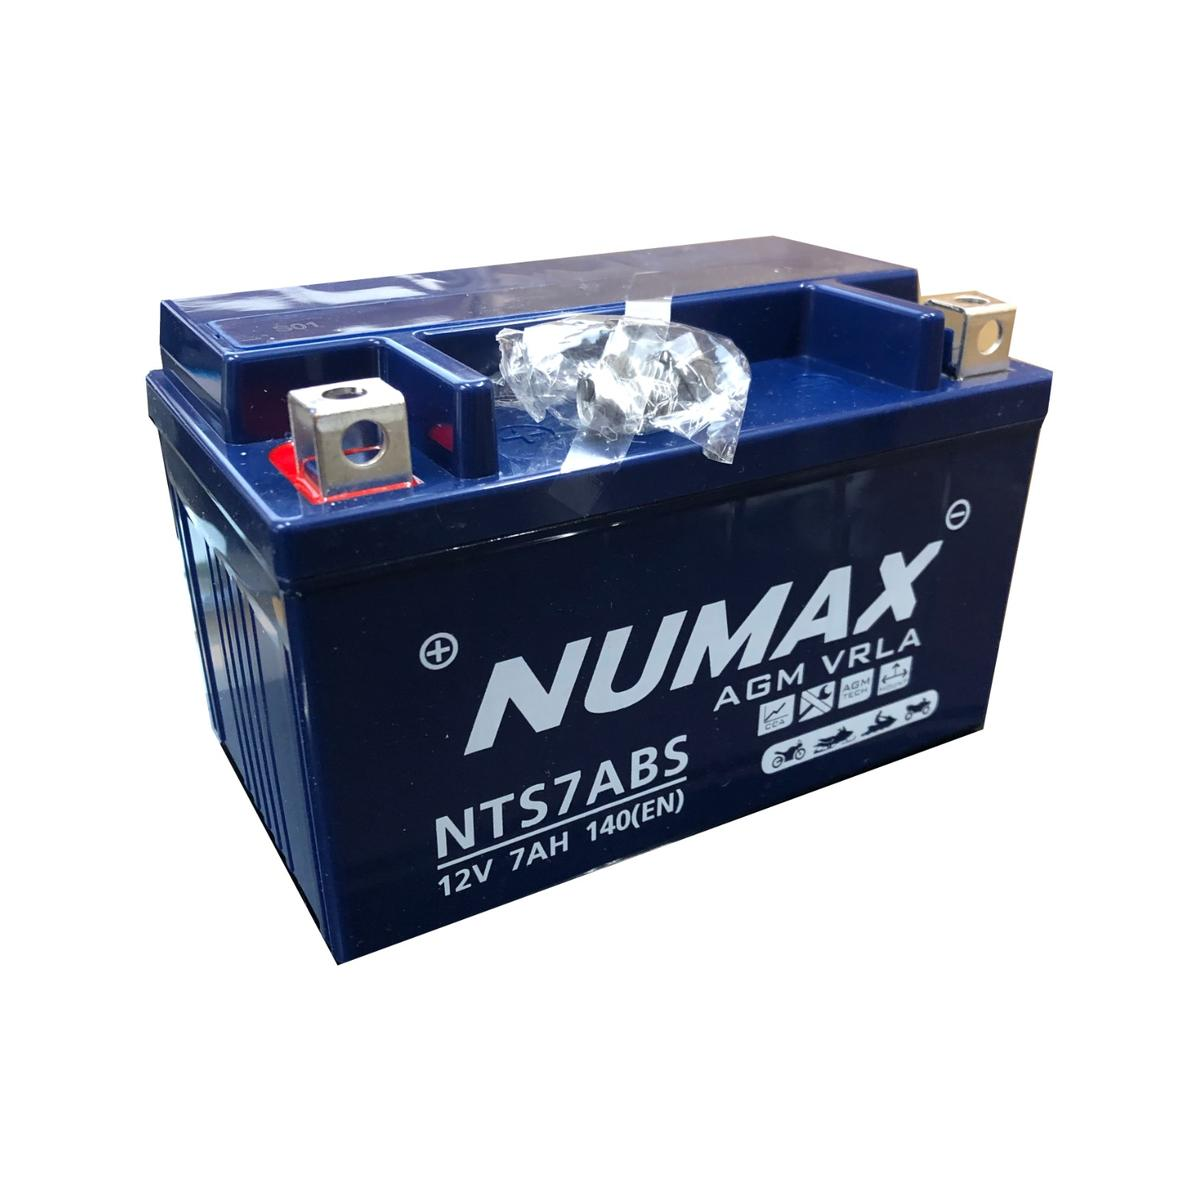 Numax NTS7ABS 12v Motorbike Bike Battery HONDA 400cc VFR400R2 YTX7A-BS